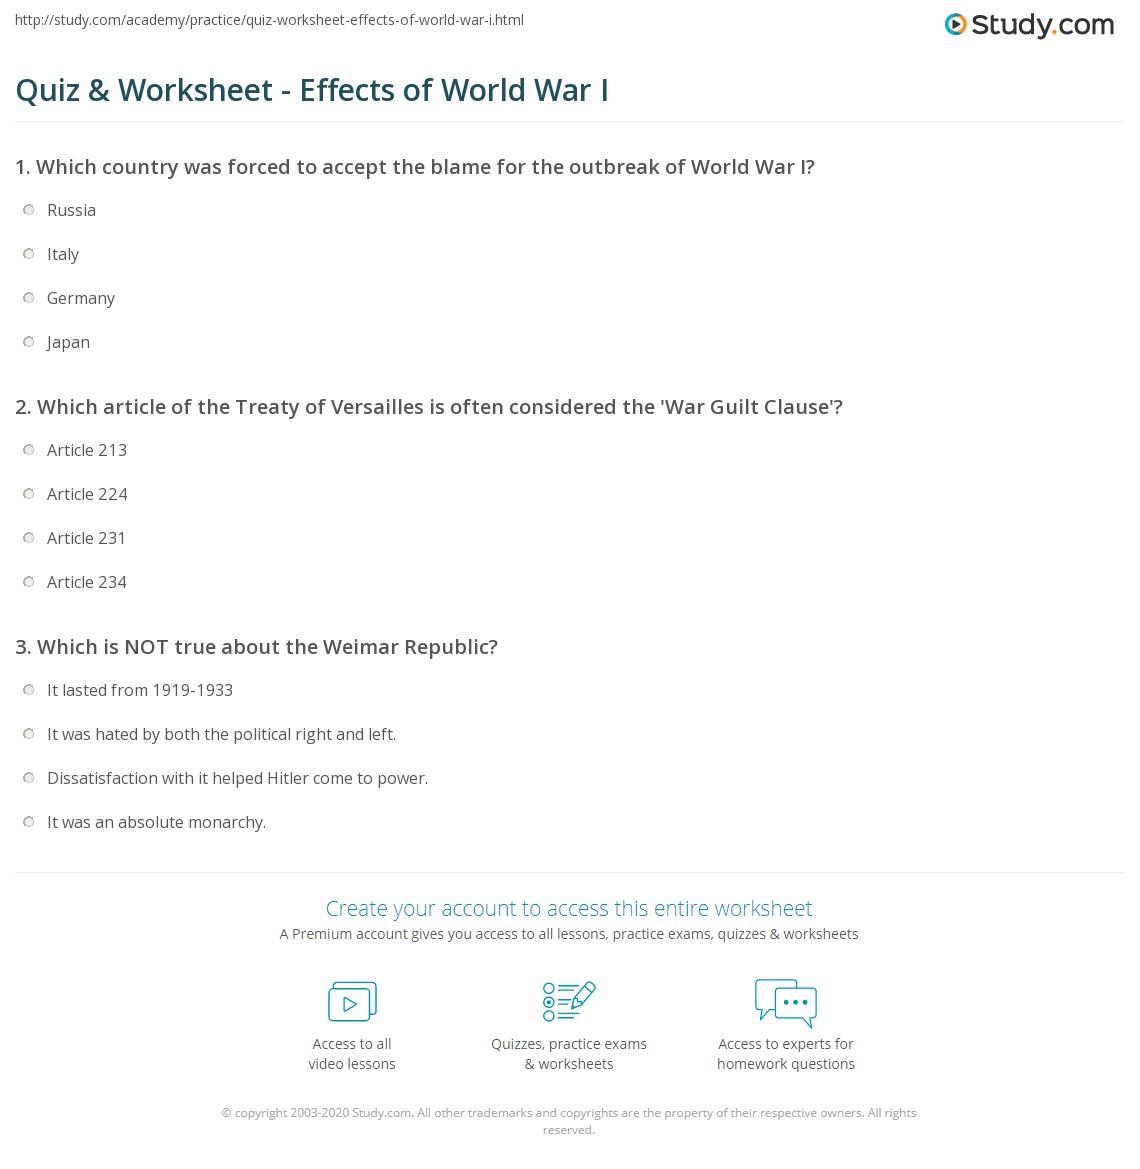 Quiz & Worksheet - Effects of World War I | Study.com